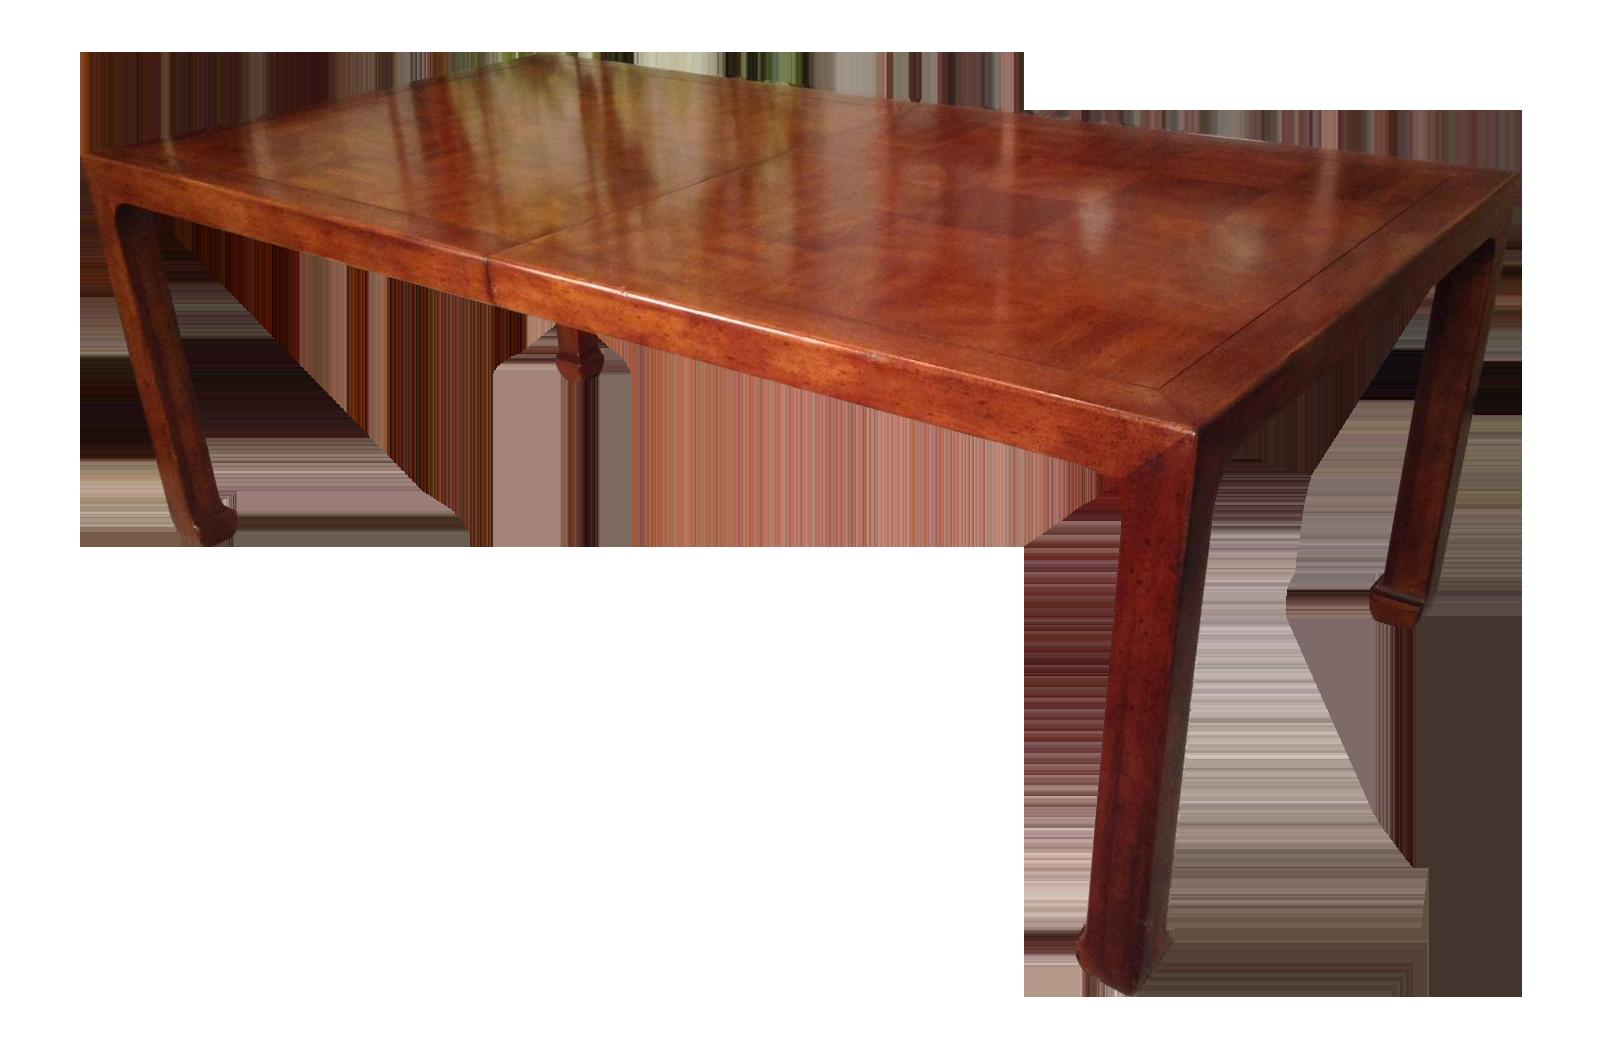 Henredon Asian Solid Mahogany Dining Table Chairish : henredon asian solid mahogany dining table 4045 from www.chairish.com size 1602 x 1050 png 573kB